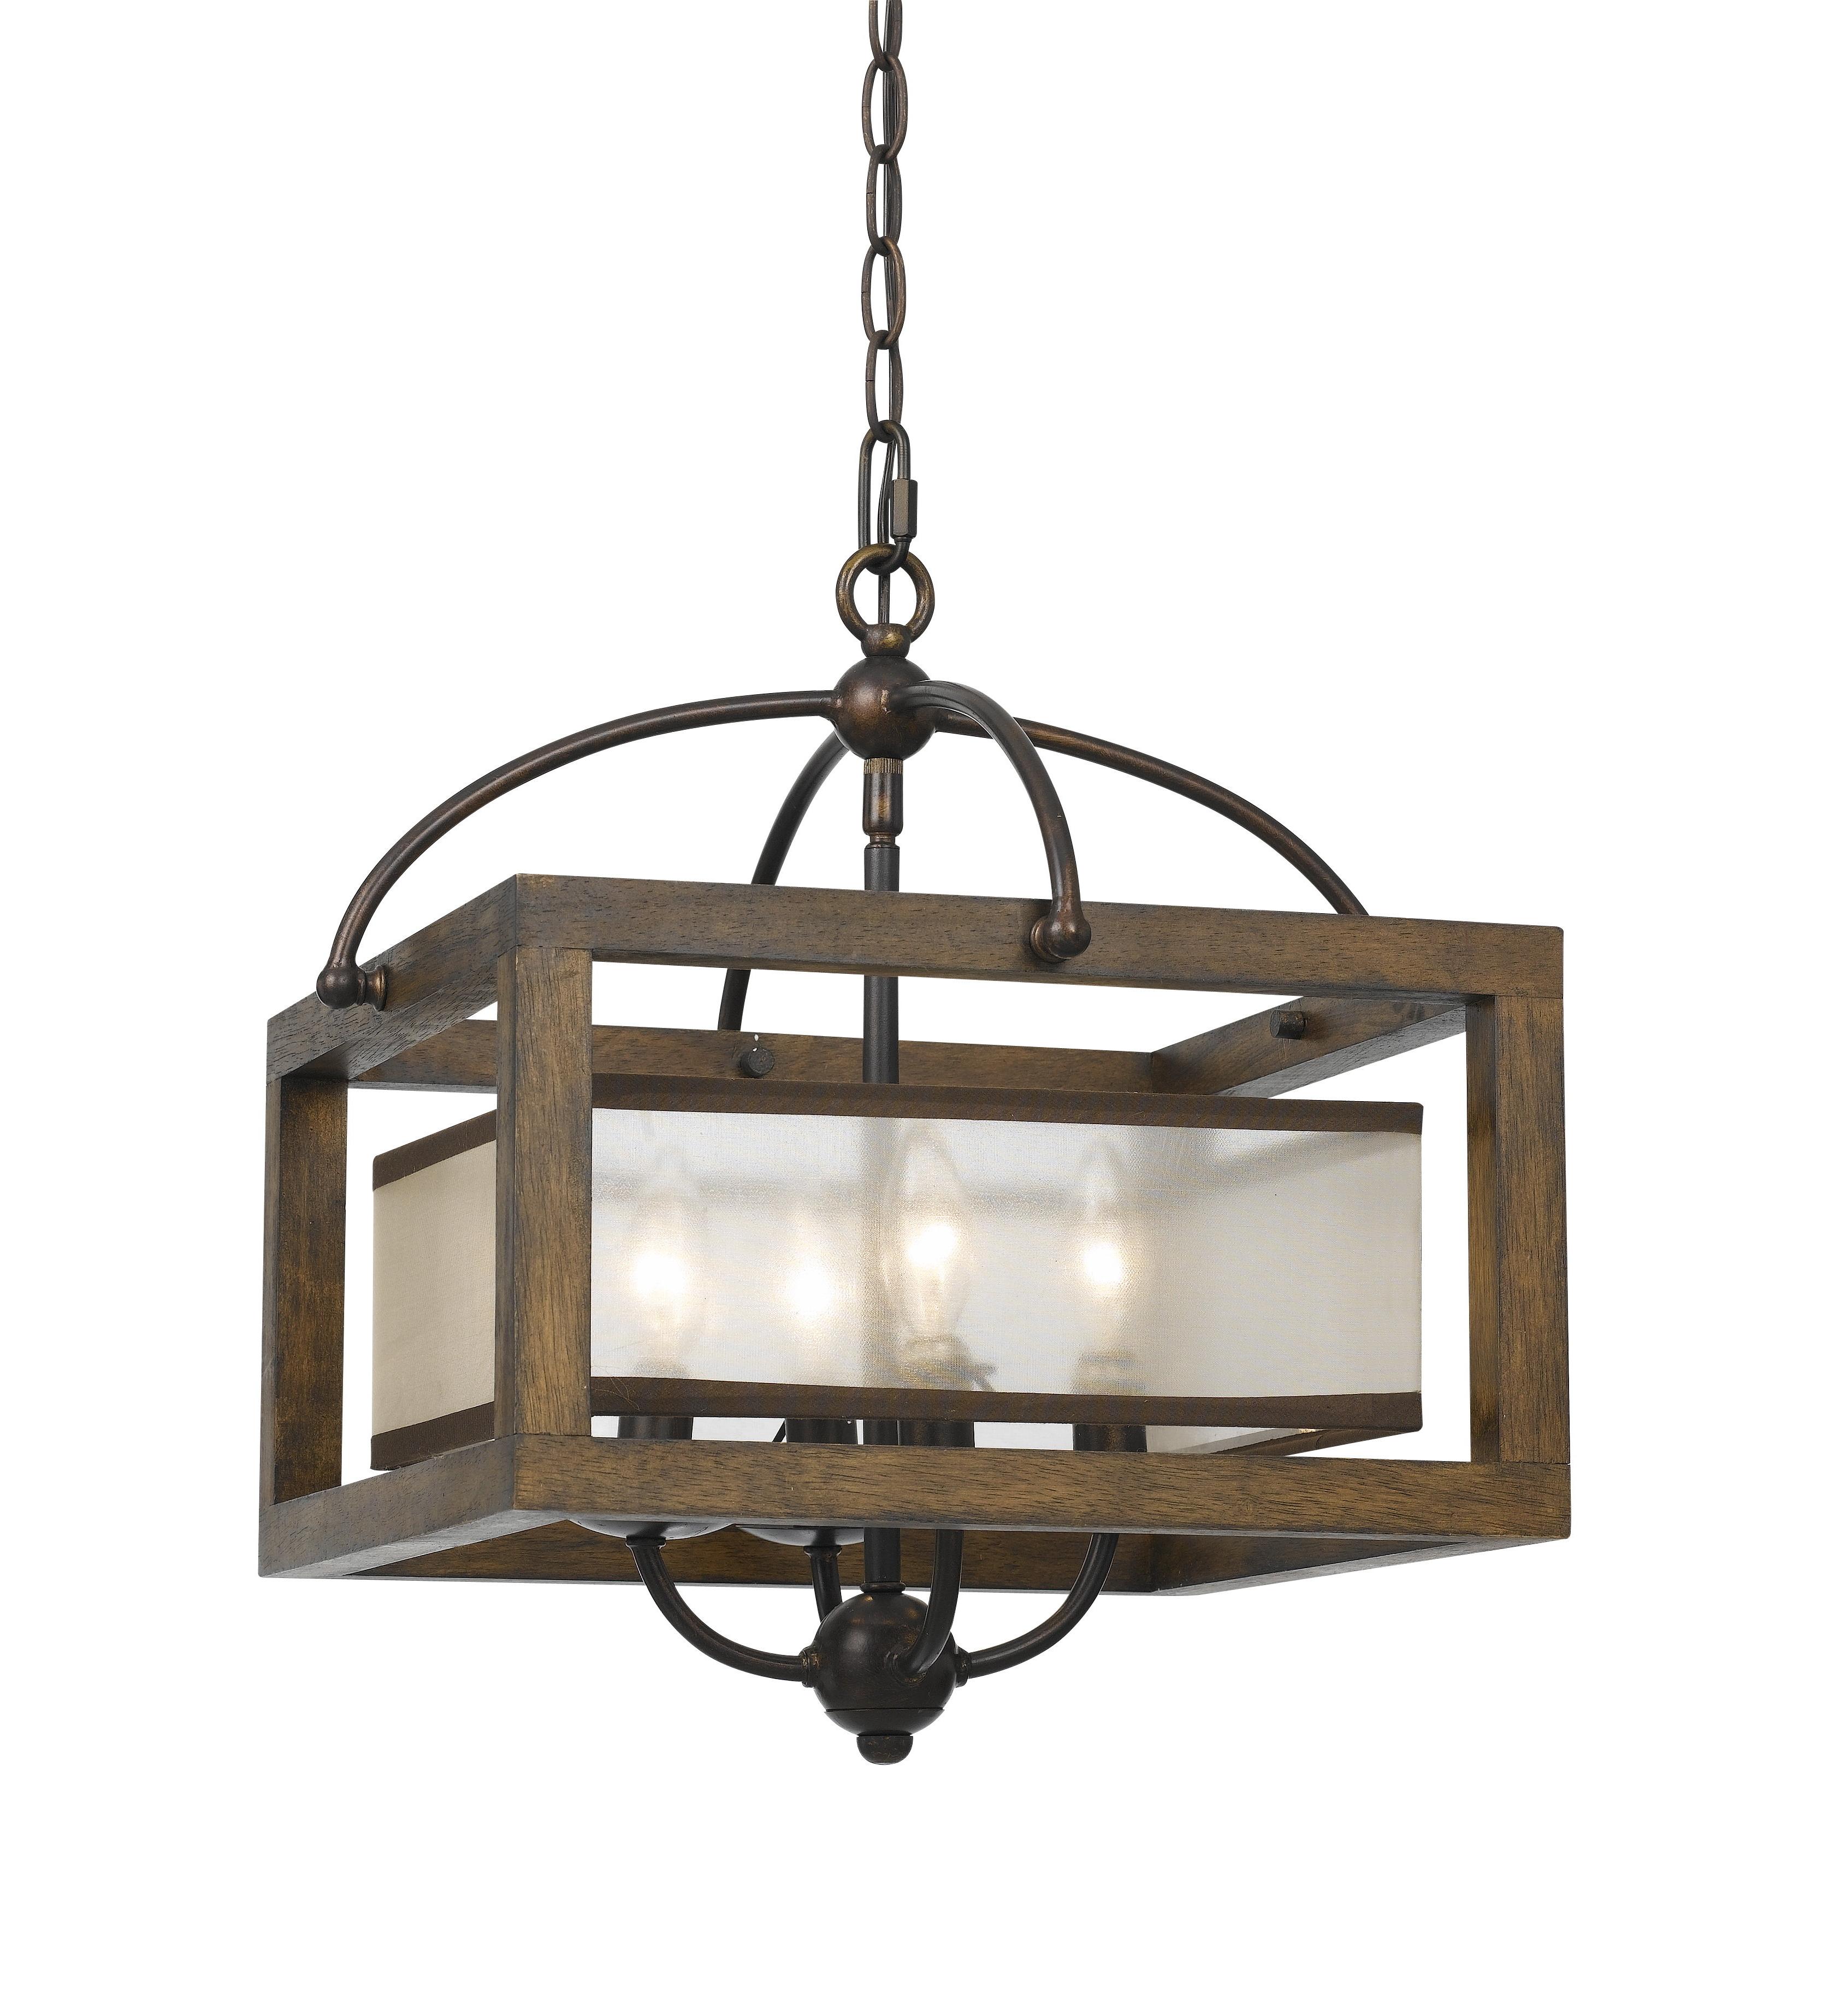 La Sarre 3 Light Globe Chandeliers Within Trendy Bundoran 4 Light Square/rectangle Chandelier (View 11 of 20)